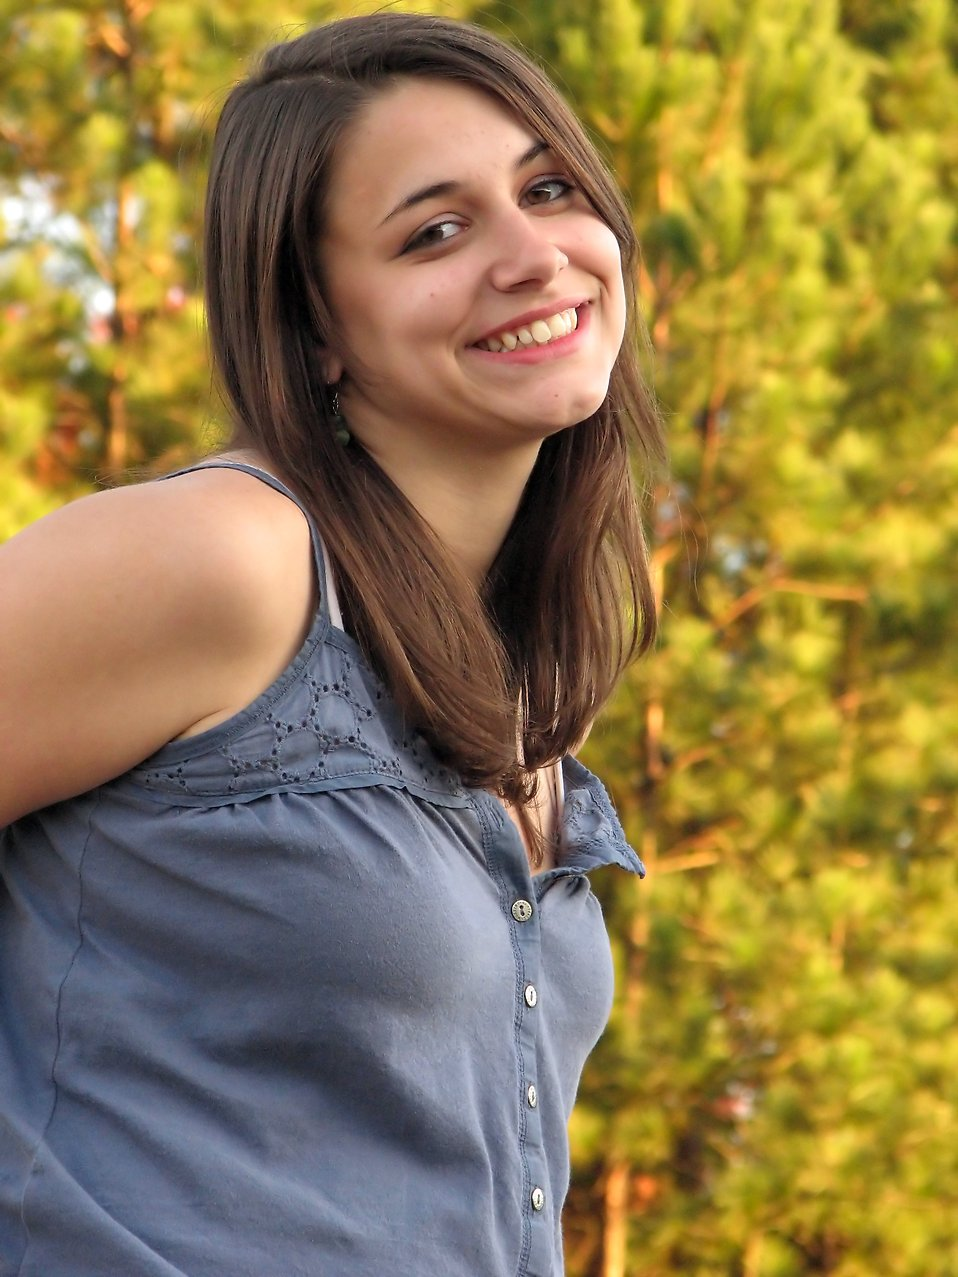 Girl Beautiful   Free Stock Photo   Close-up portrait of a ... on Beautiful Teen  id=75414